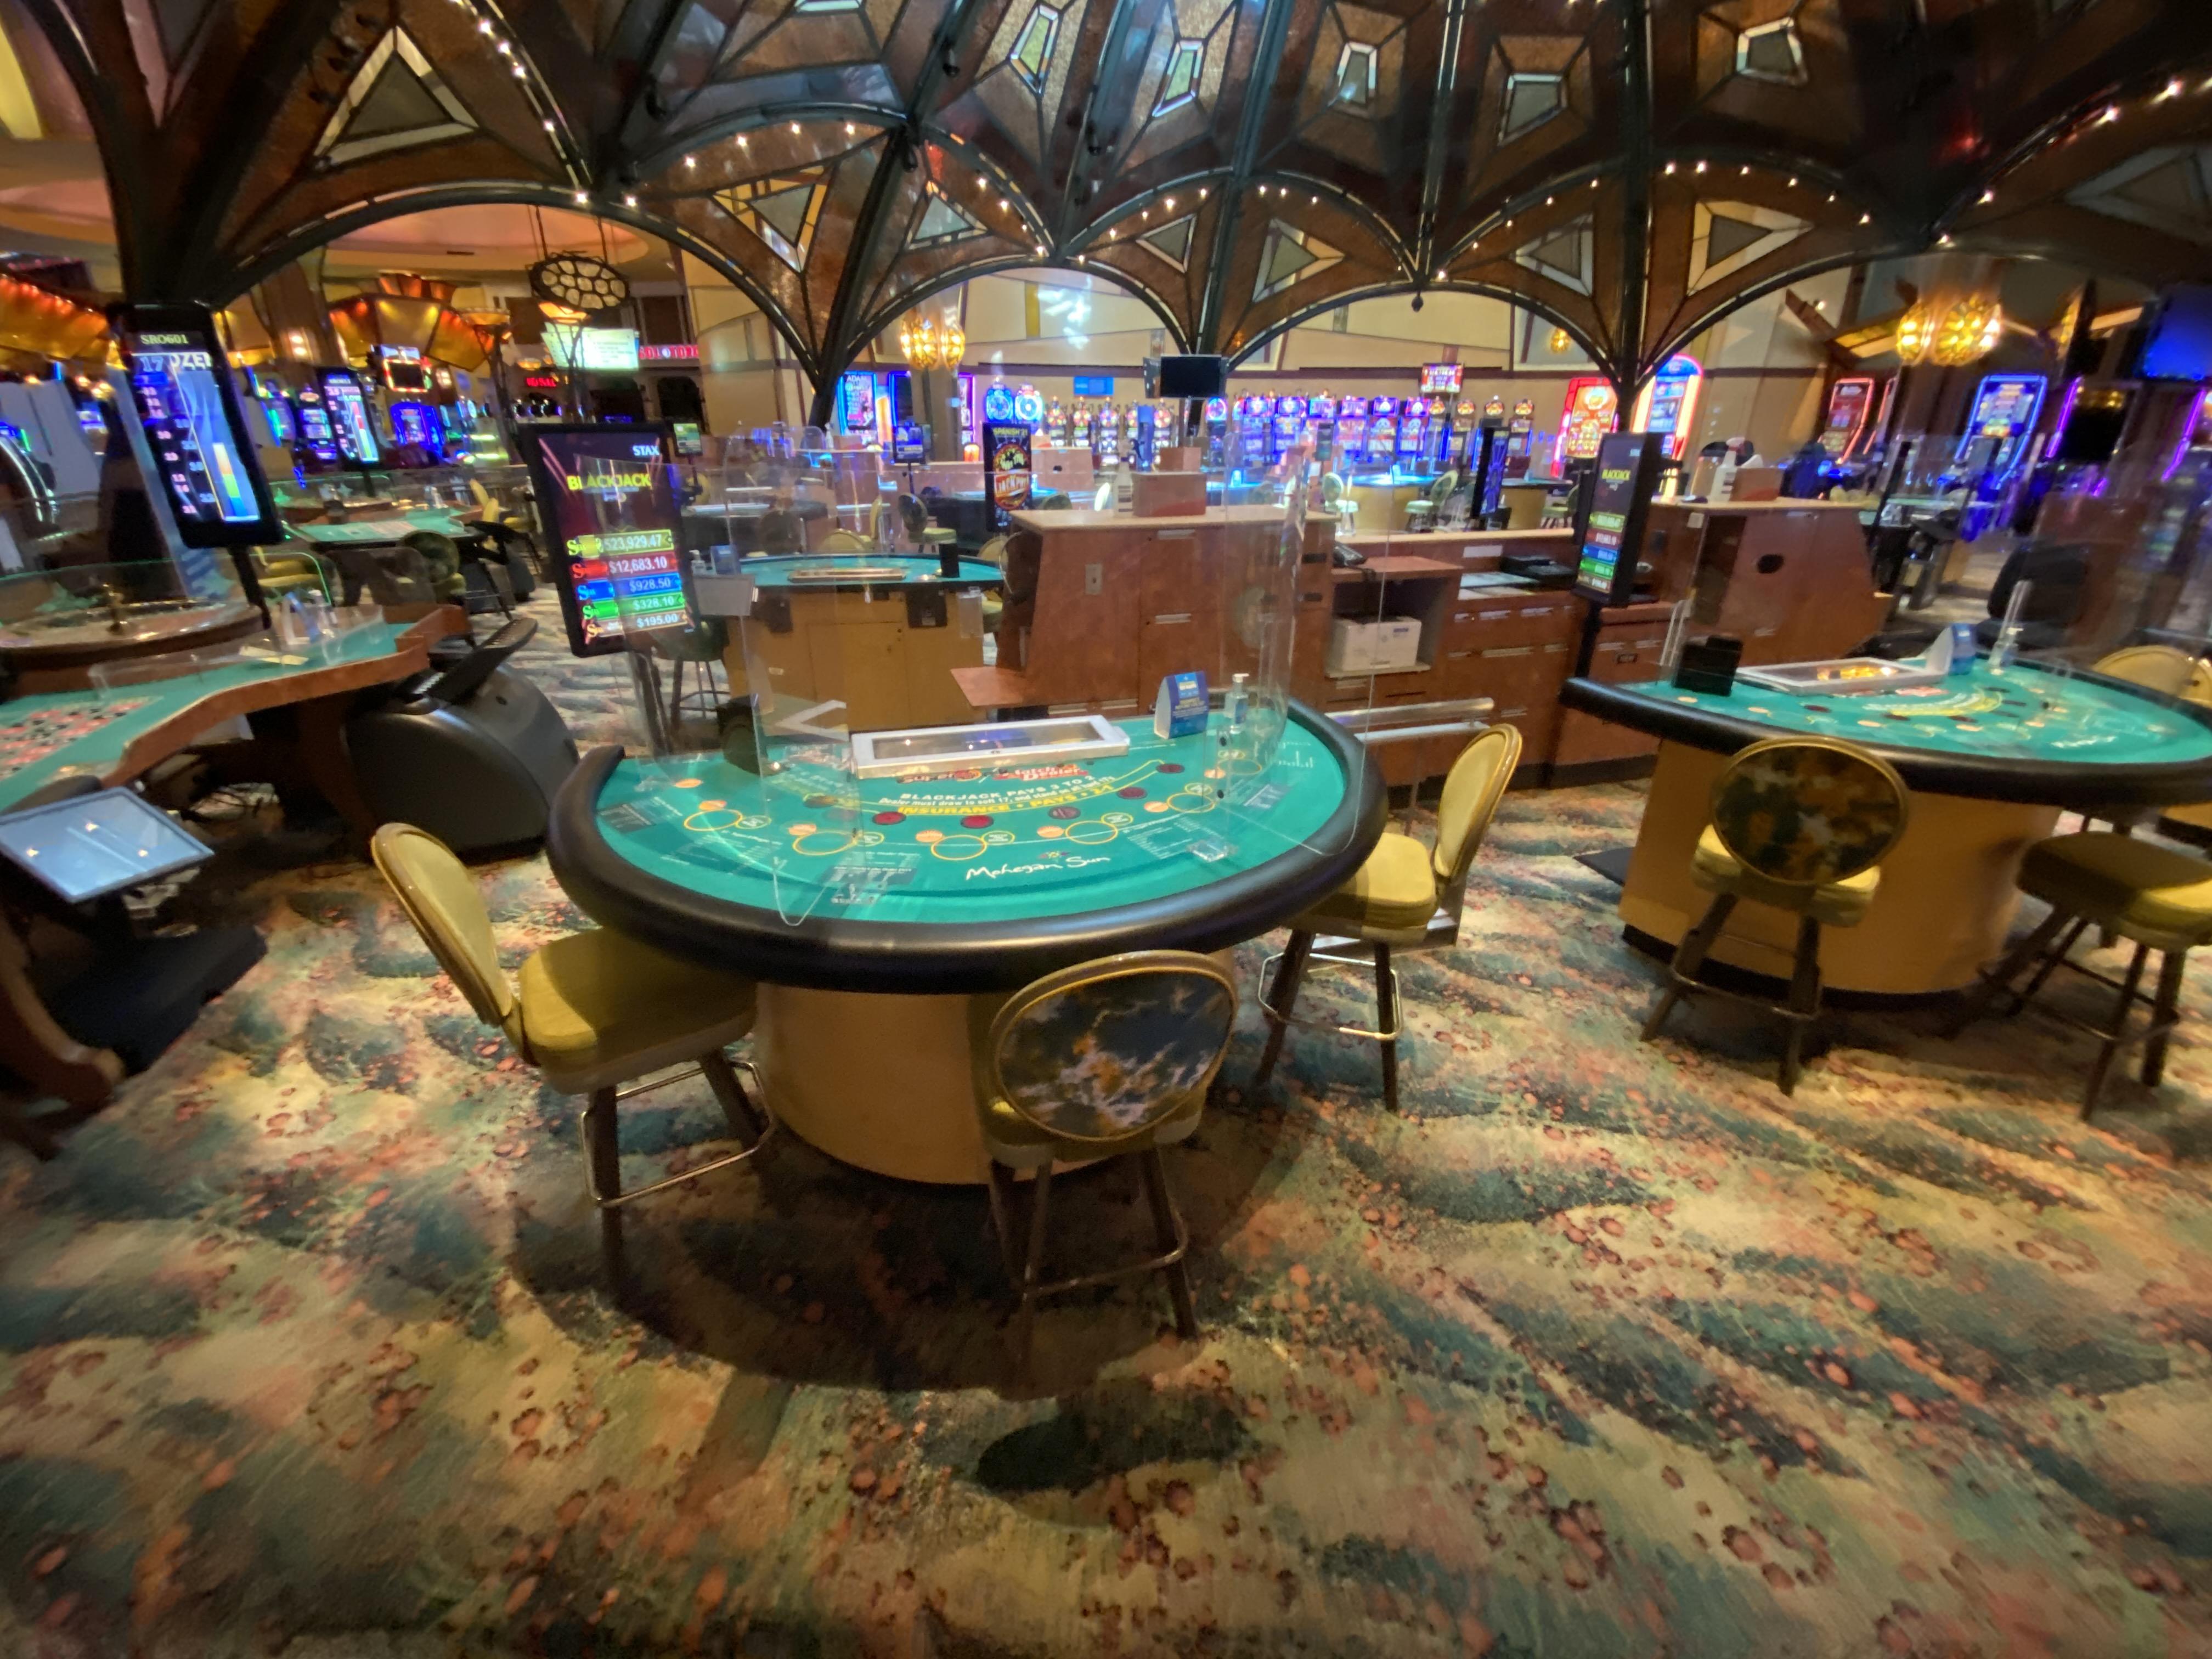 Nbc casino casino new sites.com